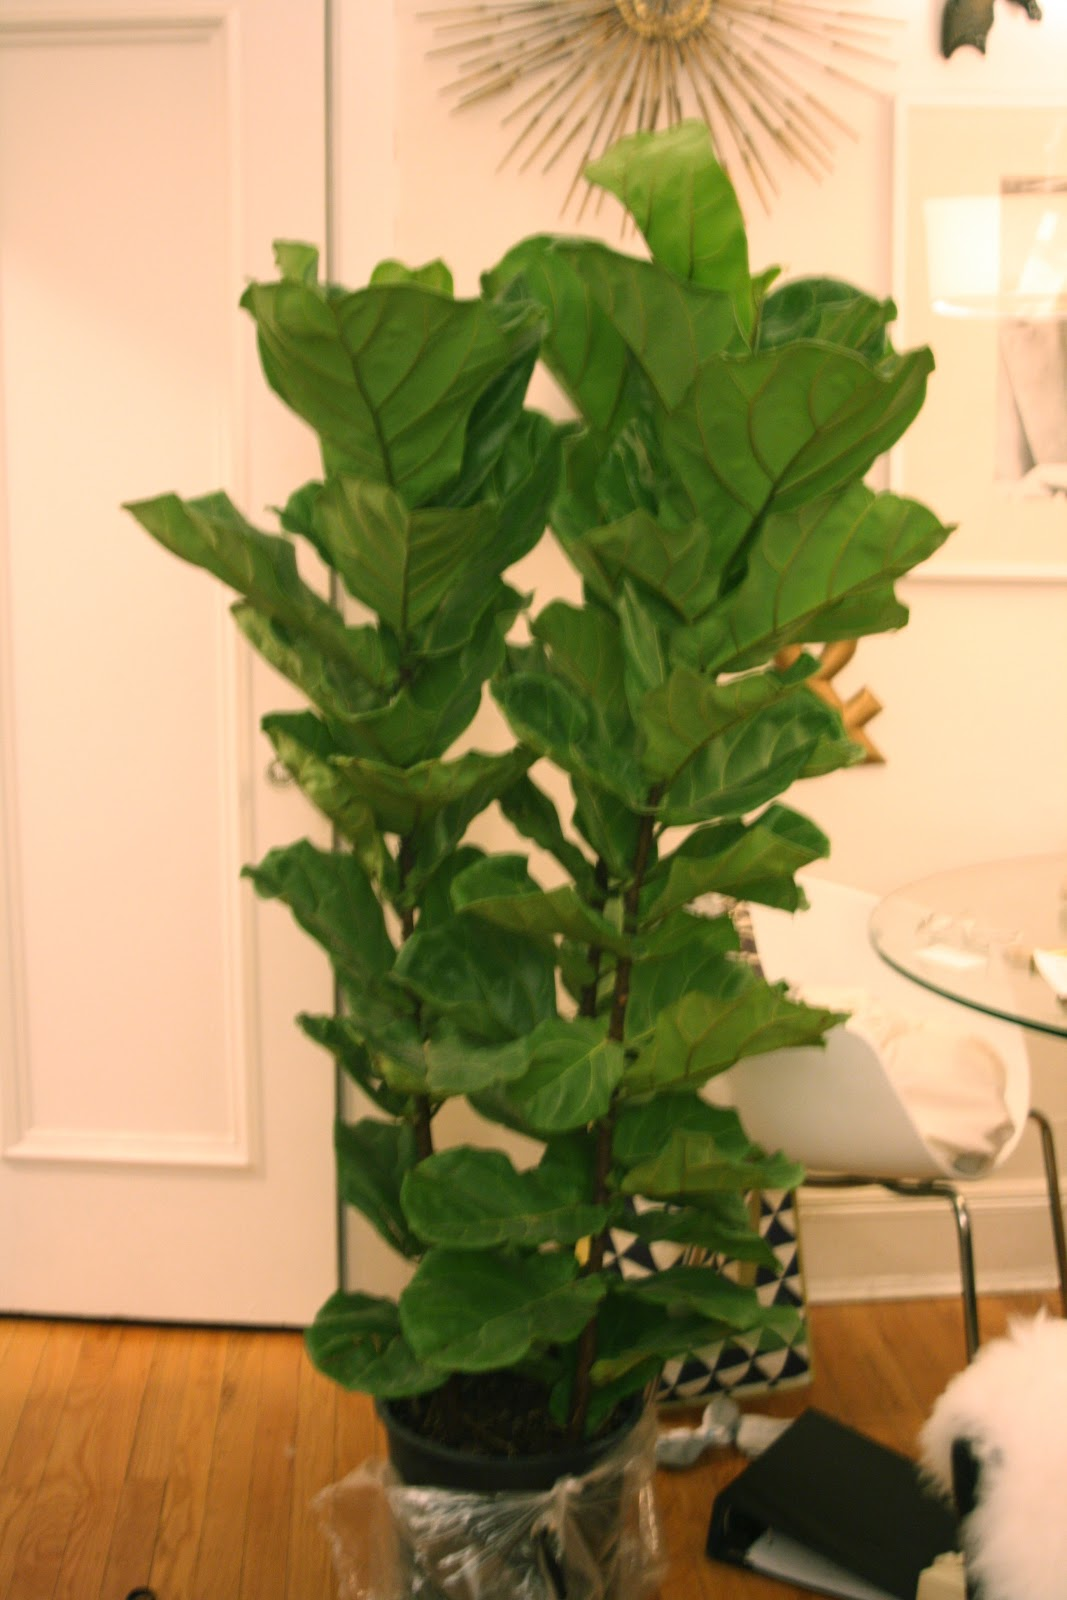 fiddle leaf fig tree from Gethsemane